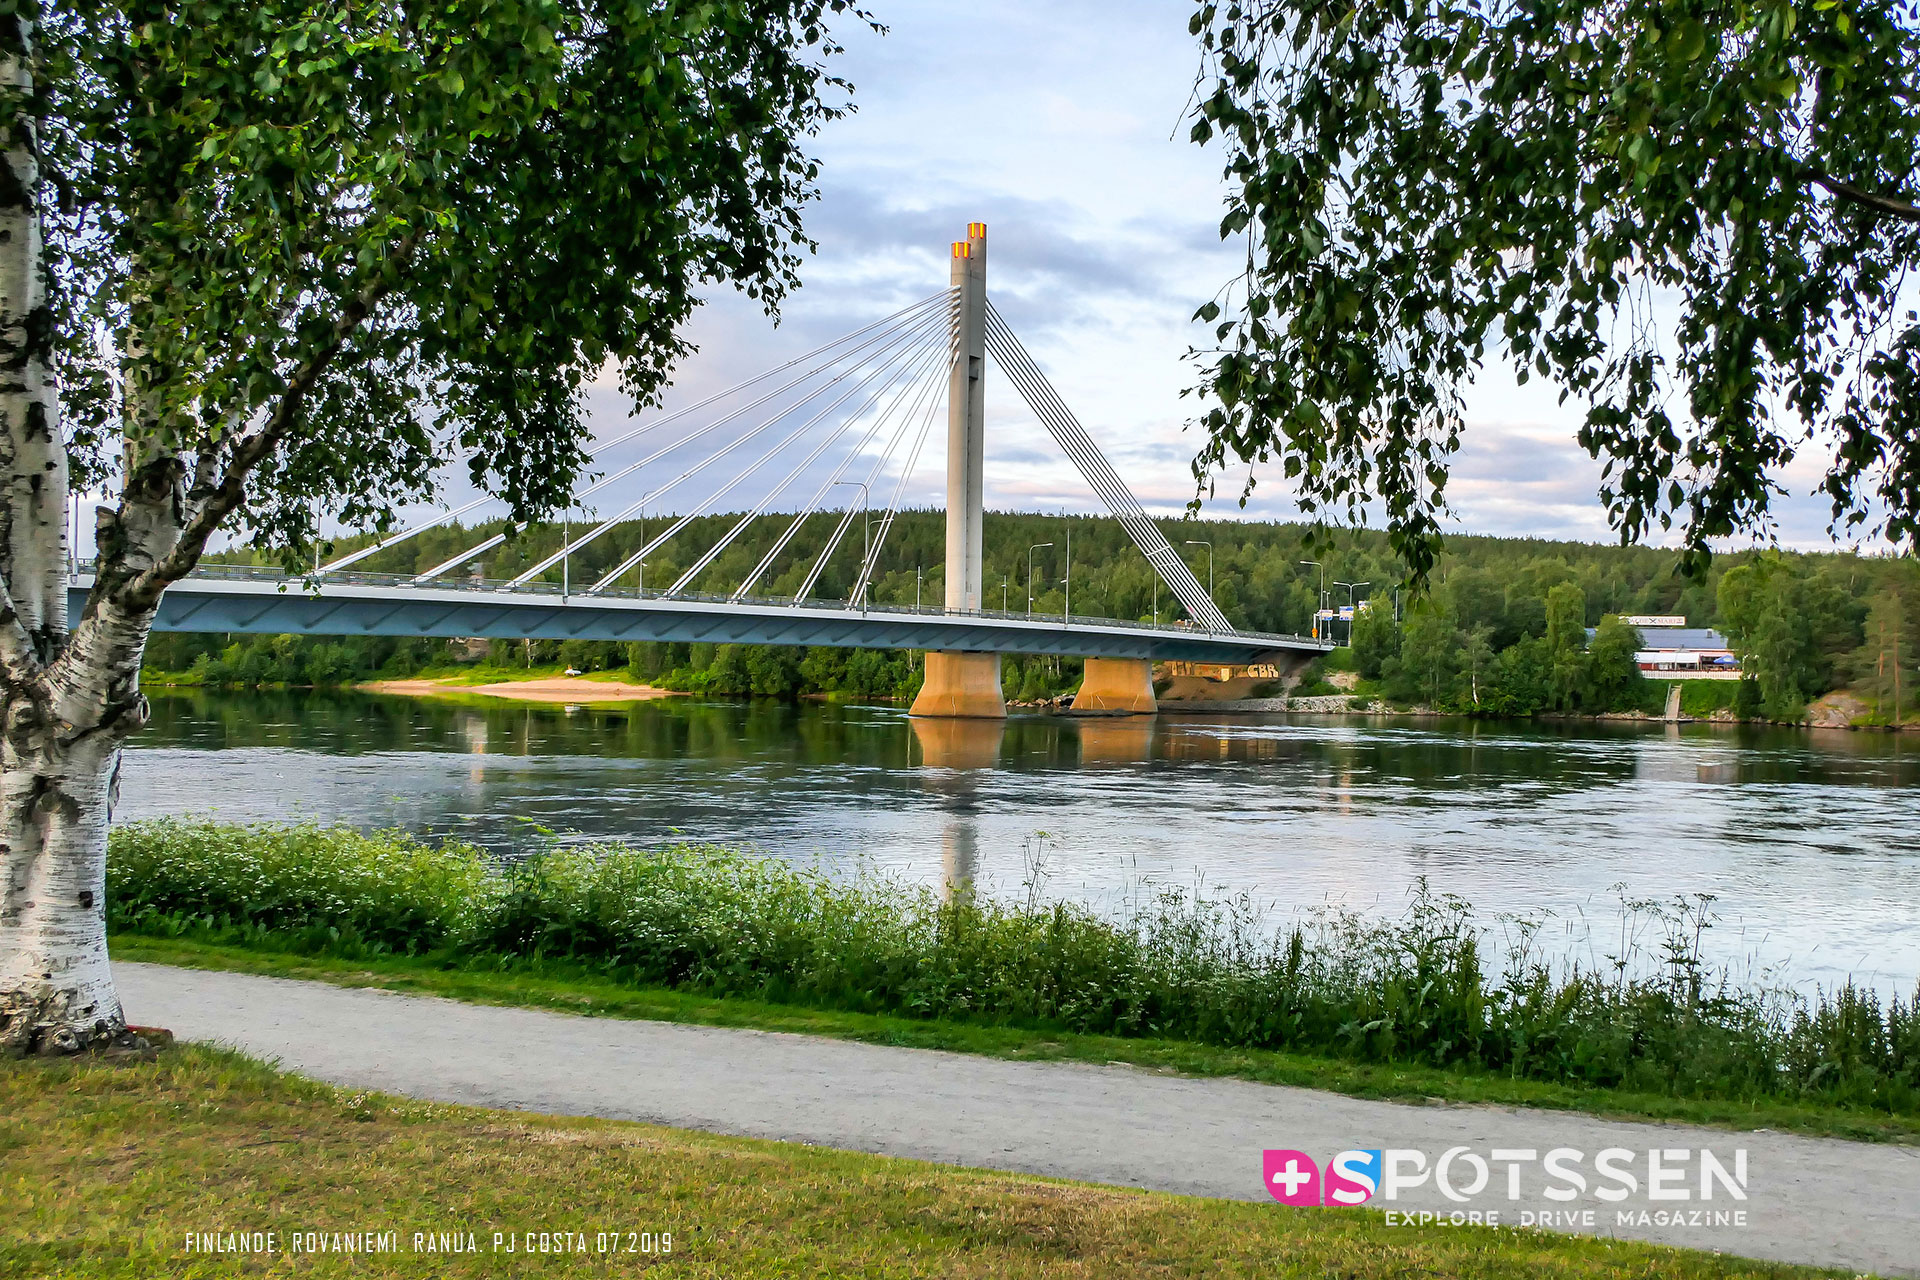 2019, rovaniemi, finlande, Jätkänkynttiläsilta